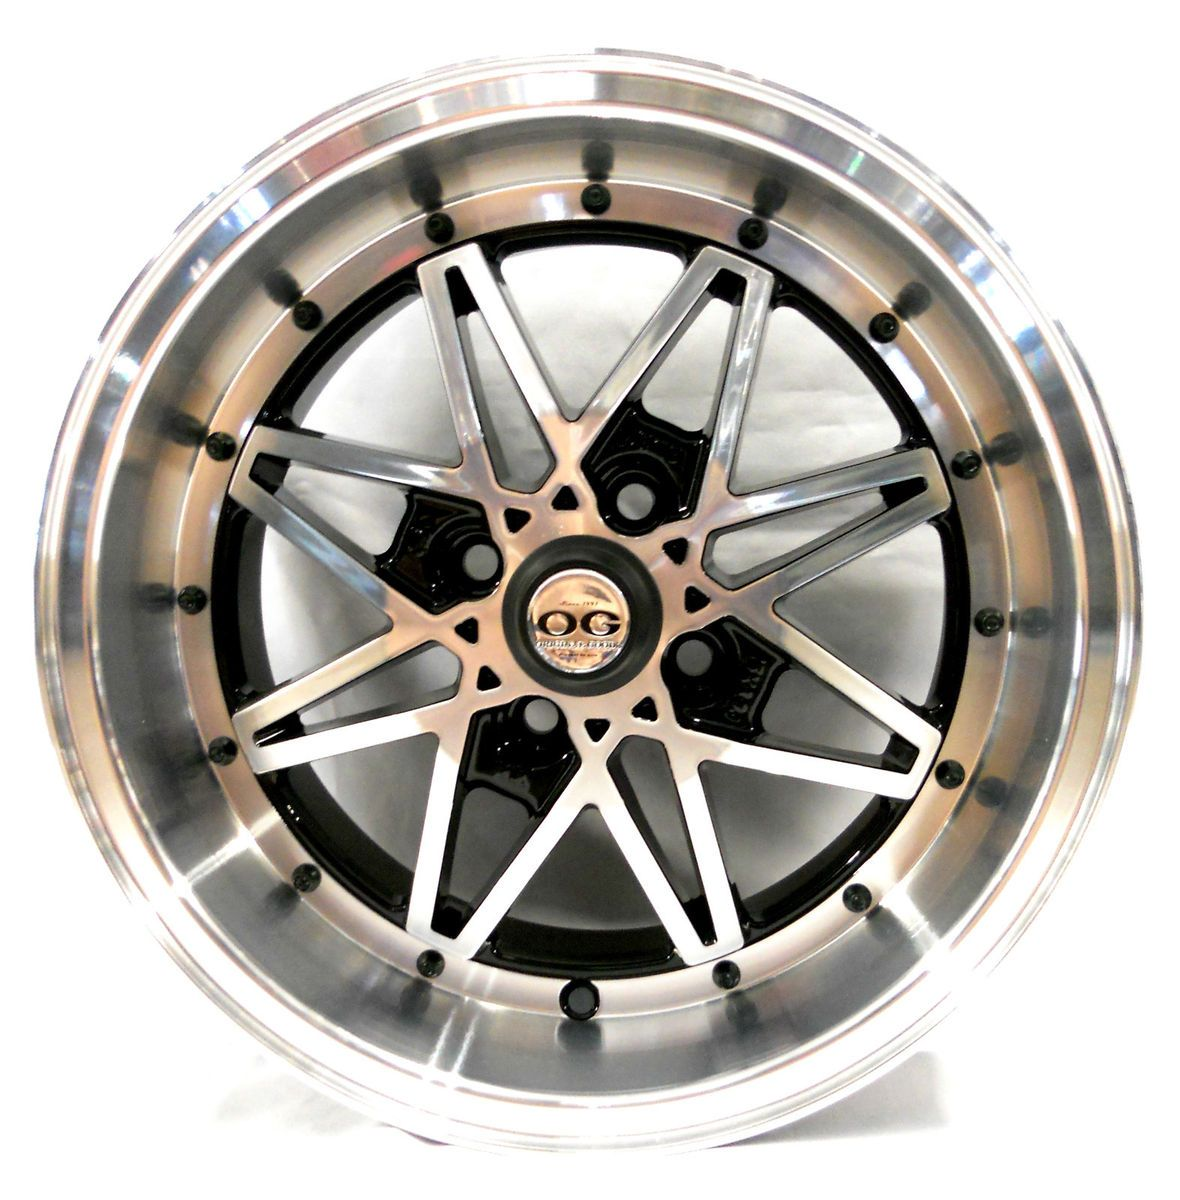 Axis OG Oldschool Black Machined Face Wheel Rim s 4x100 25 4pcs